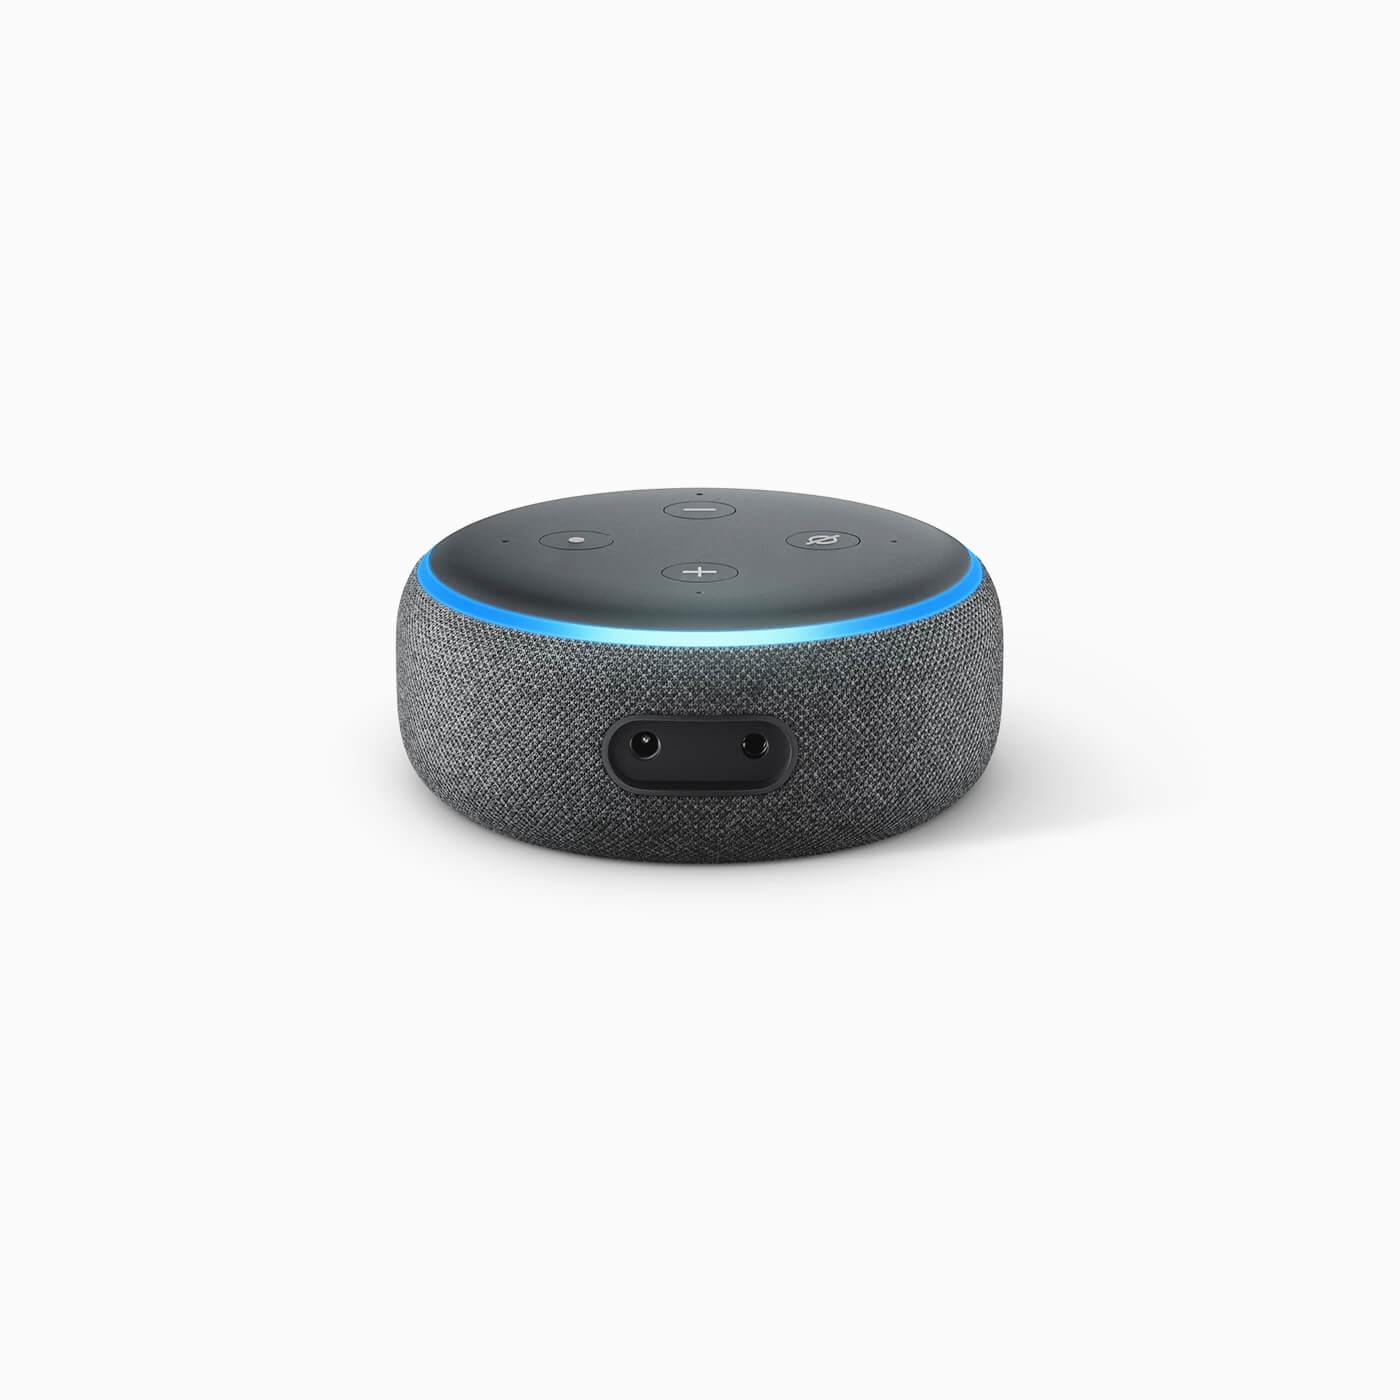 09.Amazon Echo Dot 3rd Generation